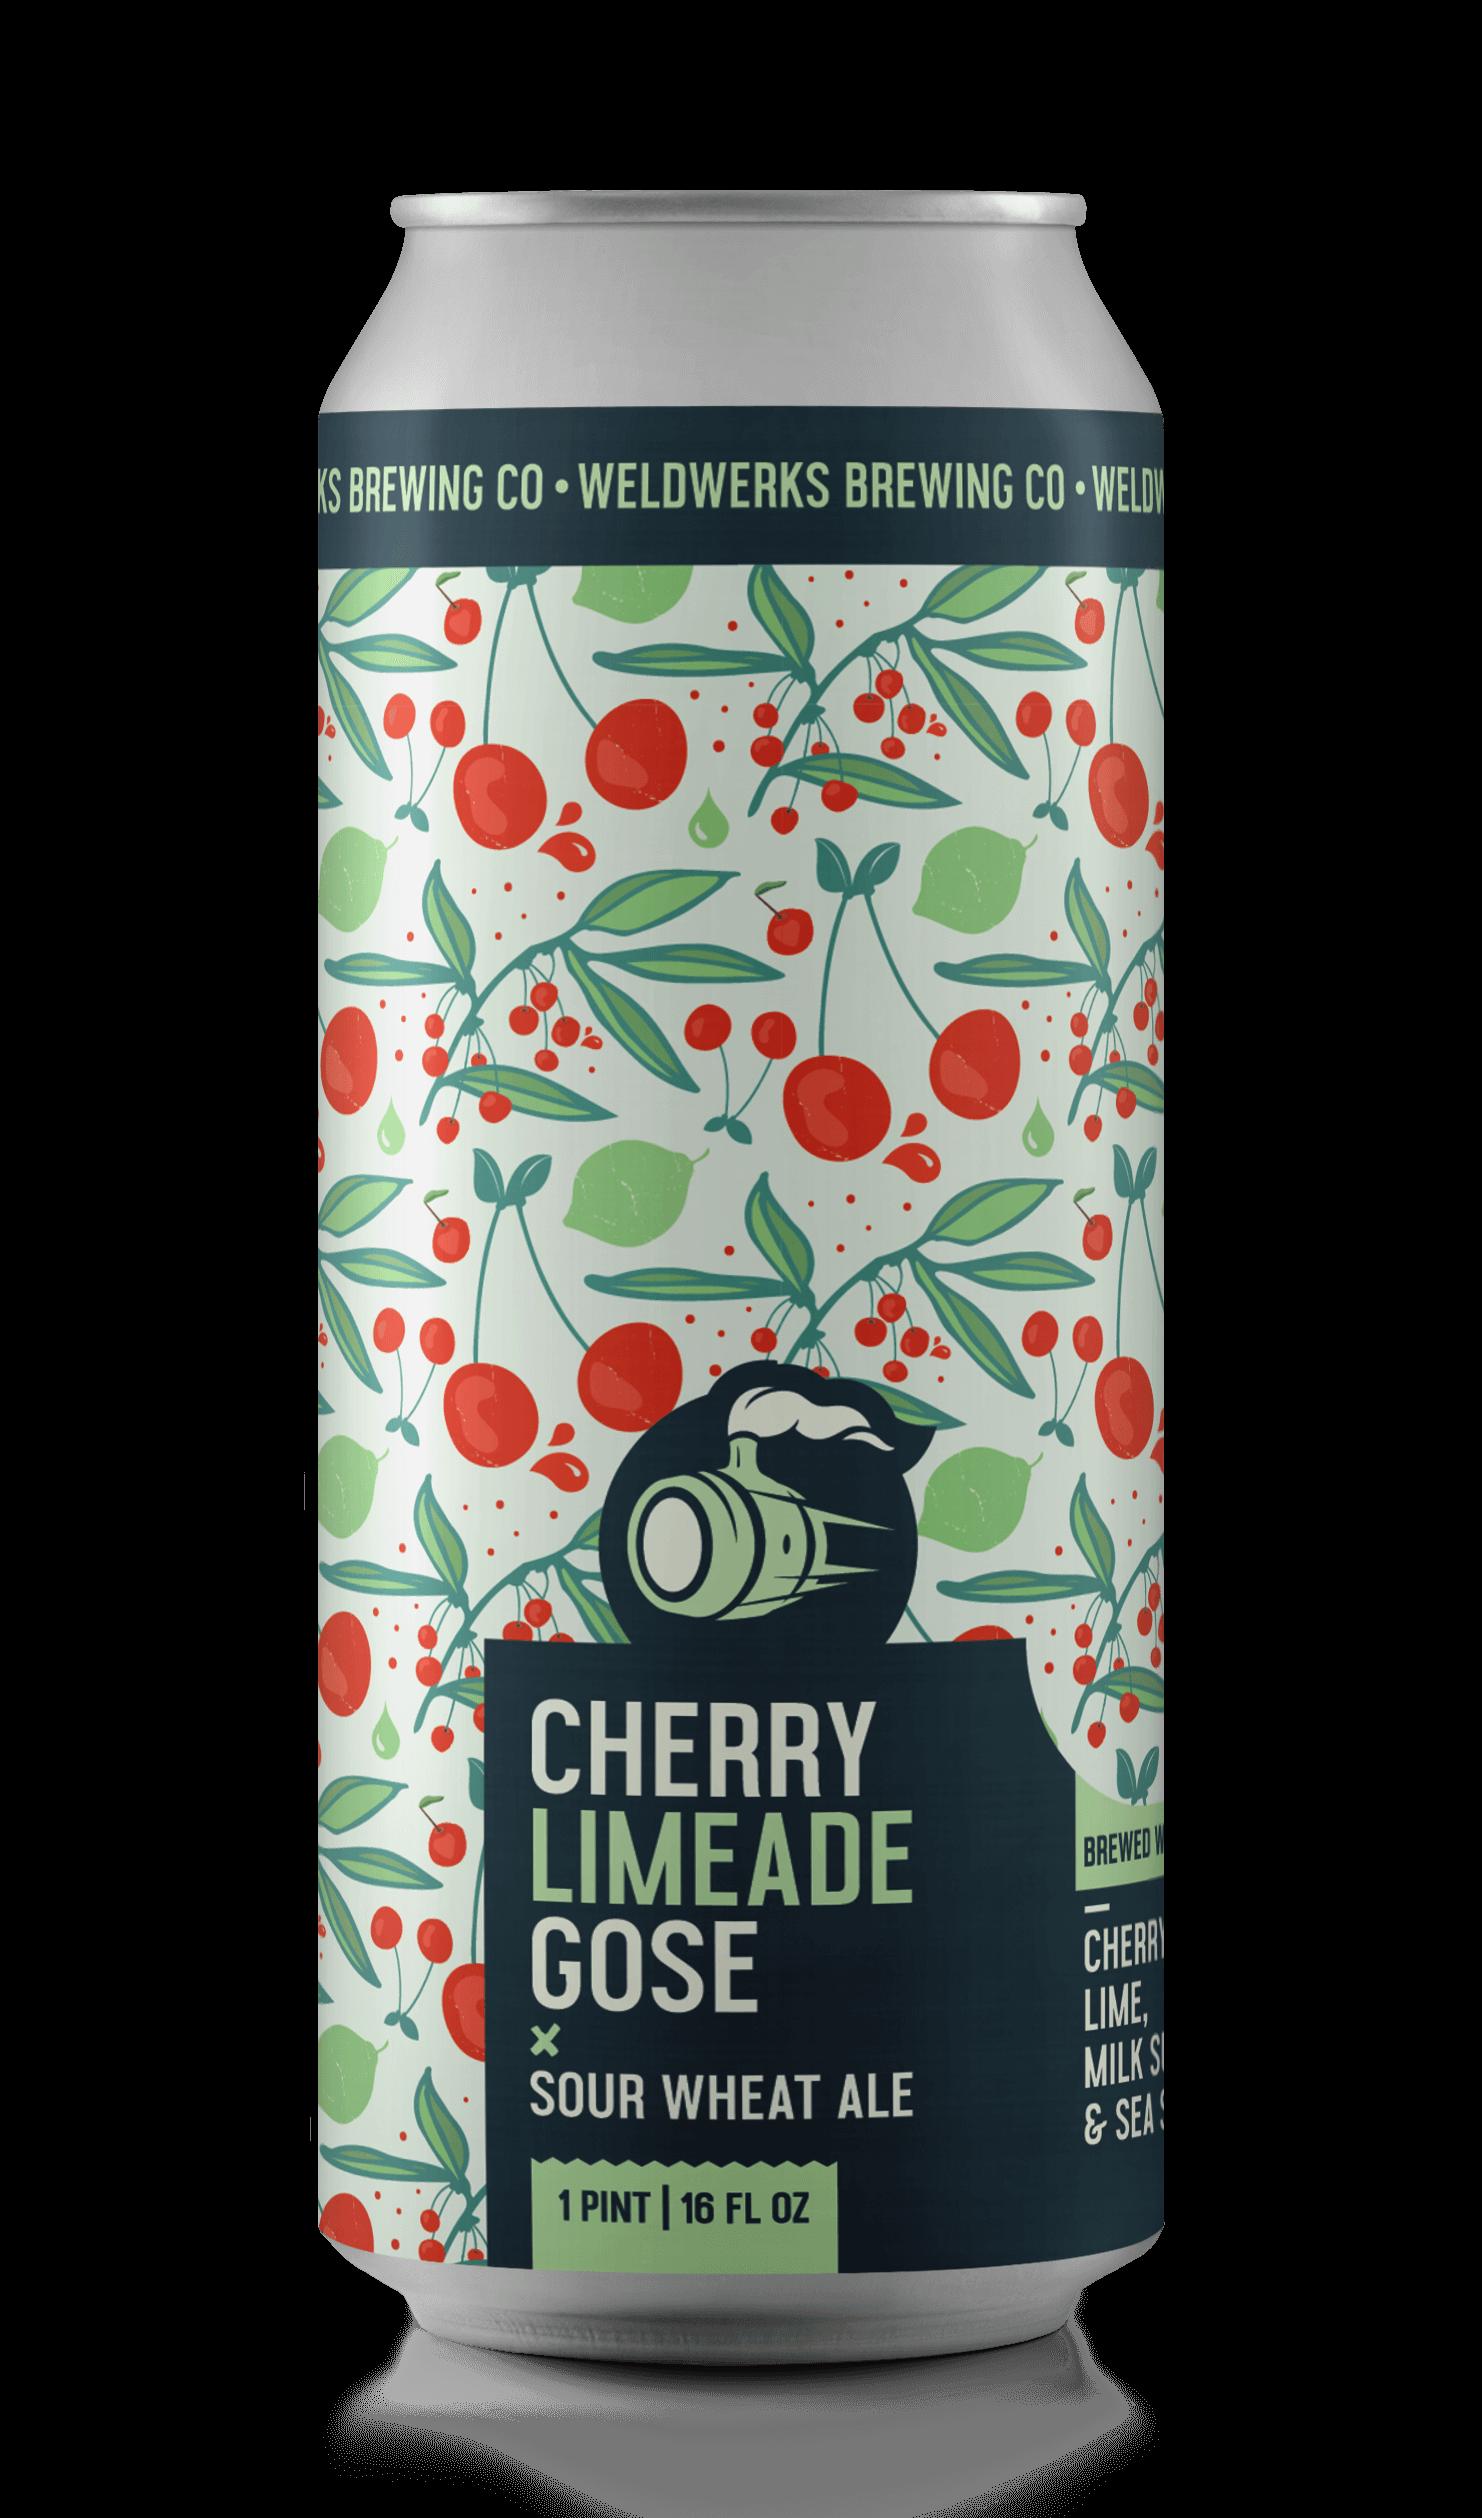 Cherry Limeade Gose